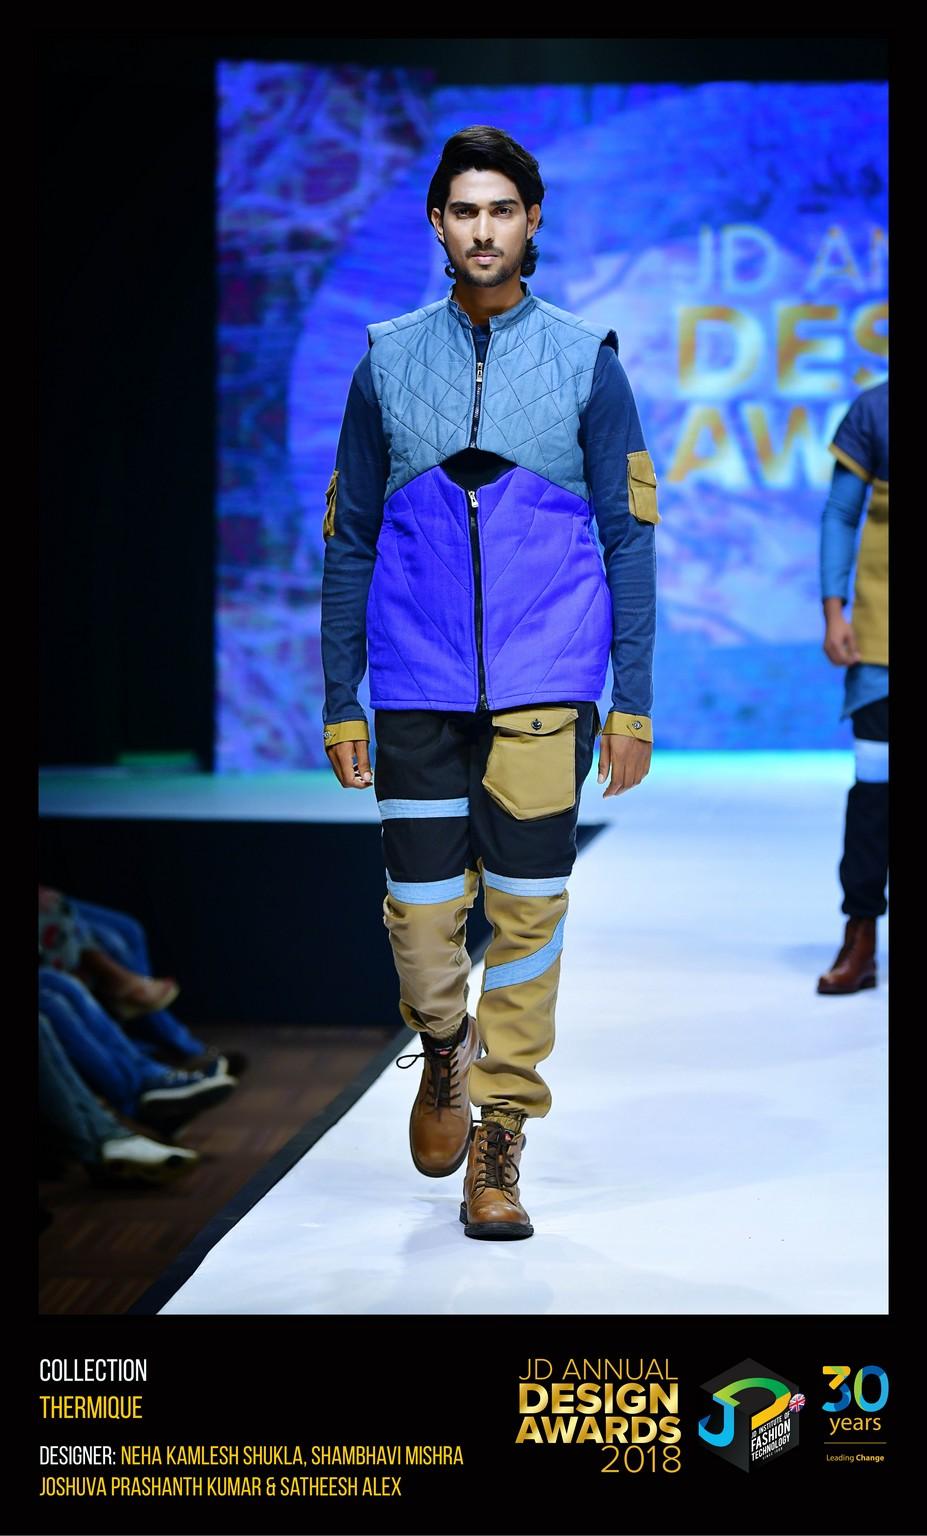 Thermique – Change – JD Annual Design Awards 2018 | Designer: Shambhavi, Neha and satish | Photography : Jerin Nath (@jerin_nath) thermique Thermique – Change – JD Annual Design Awards 2018 THERMIQUE